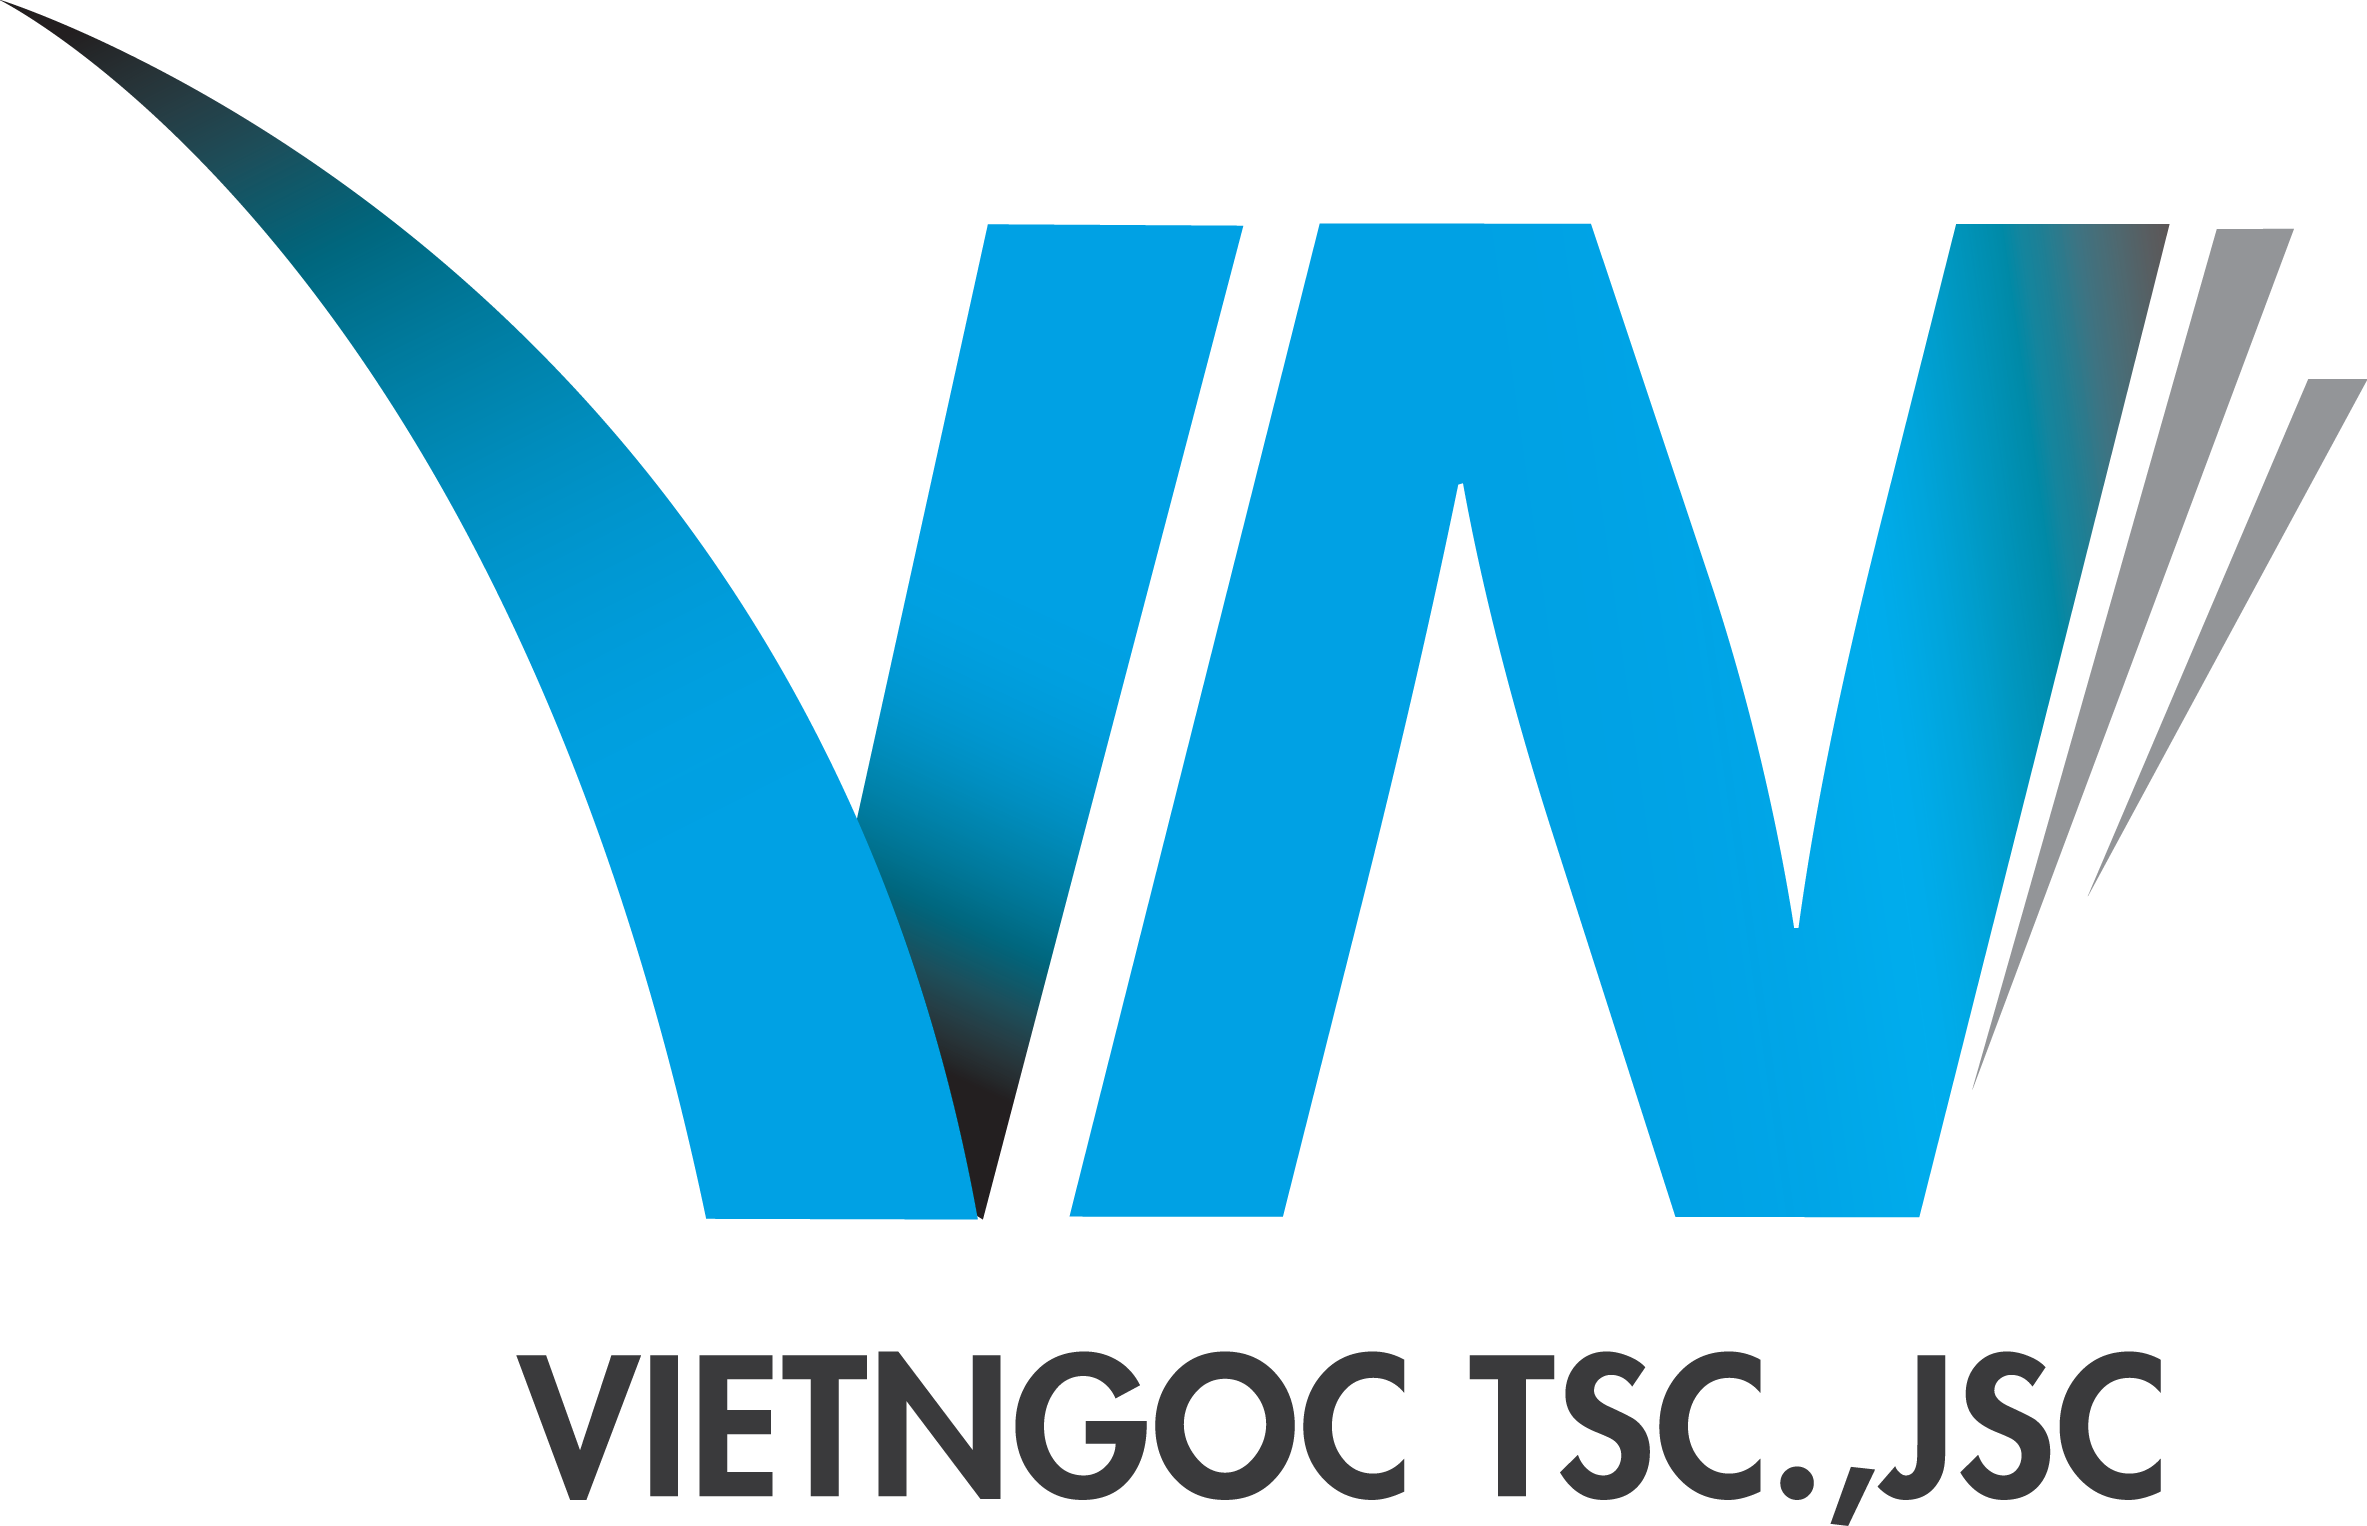 VIET NGOC INTERNATIONAL HUMAN RESOURCE STOCK COMPANY